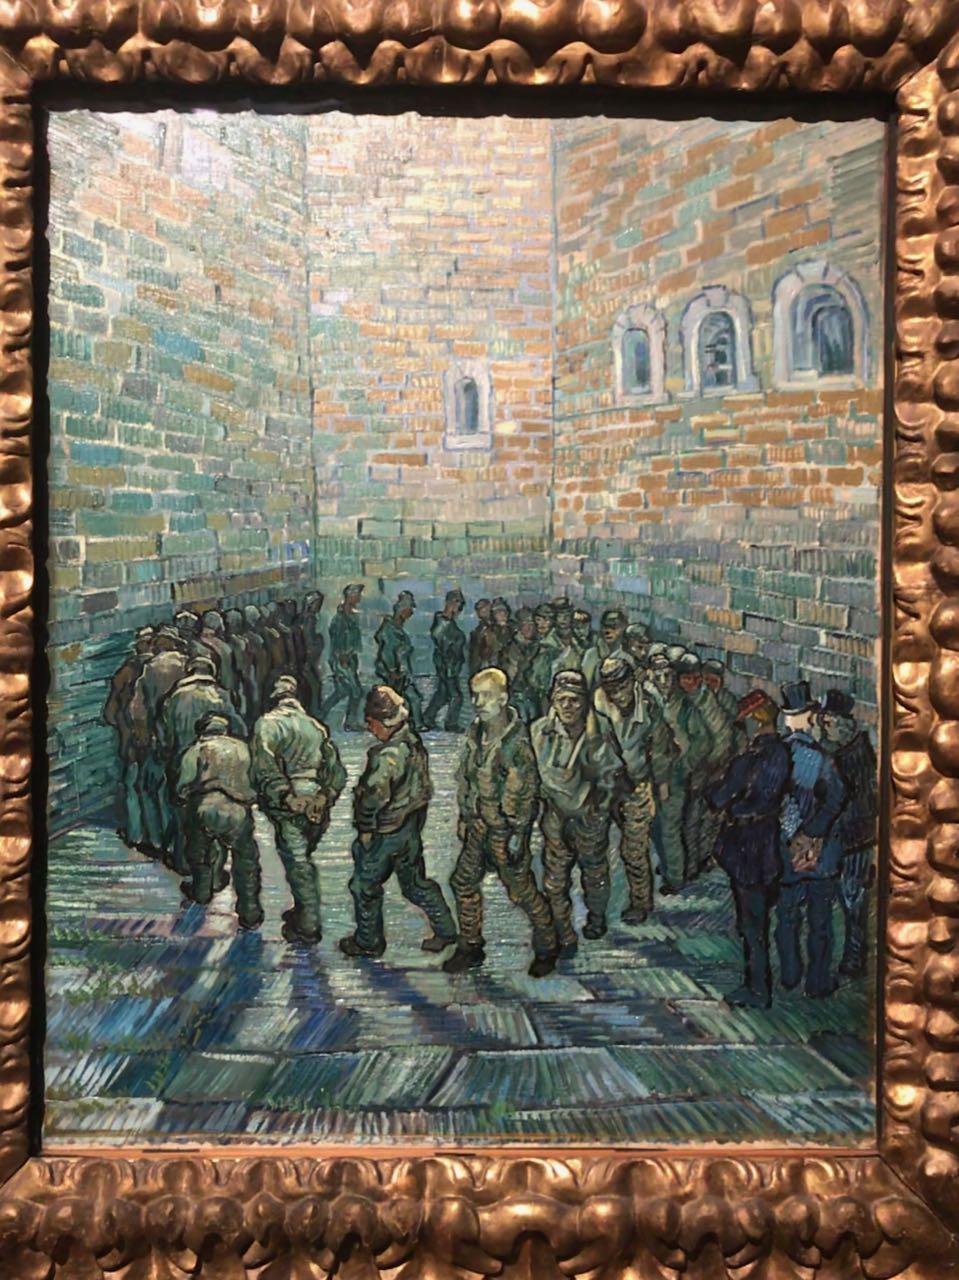 Prisoners exercising by Gustav Dore/ Van Gogh. Photo taken by Gopi Chandroth.